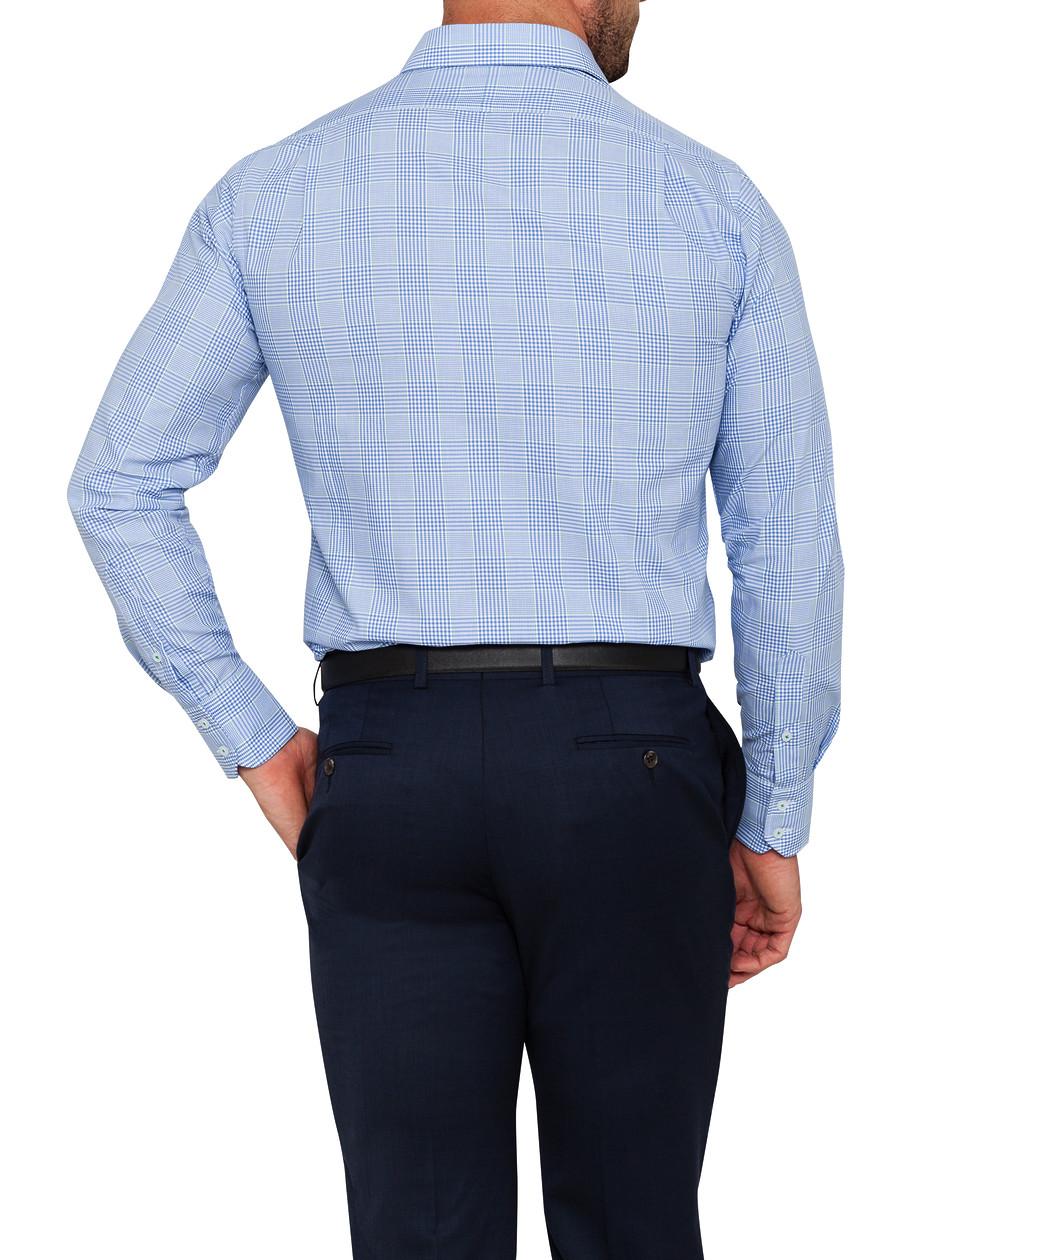 fec90c90670 Mens Euro Fit Shirt Navy Green Check